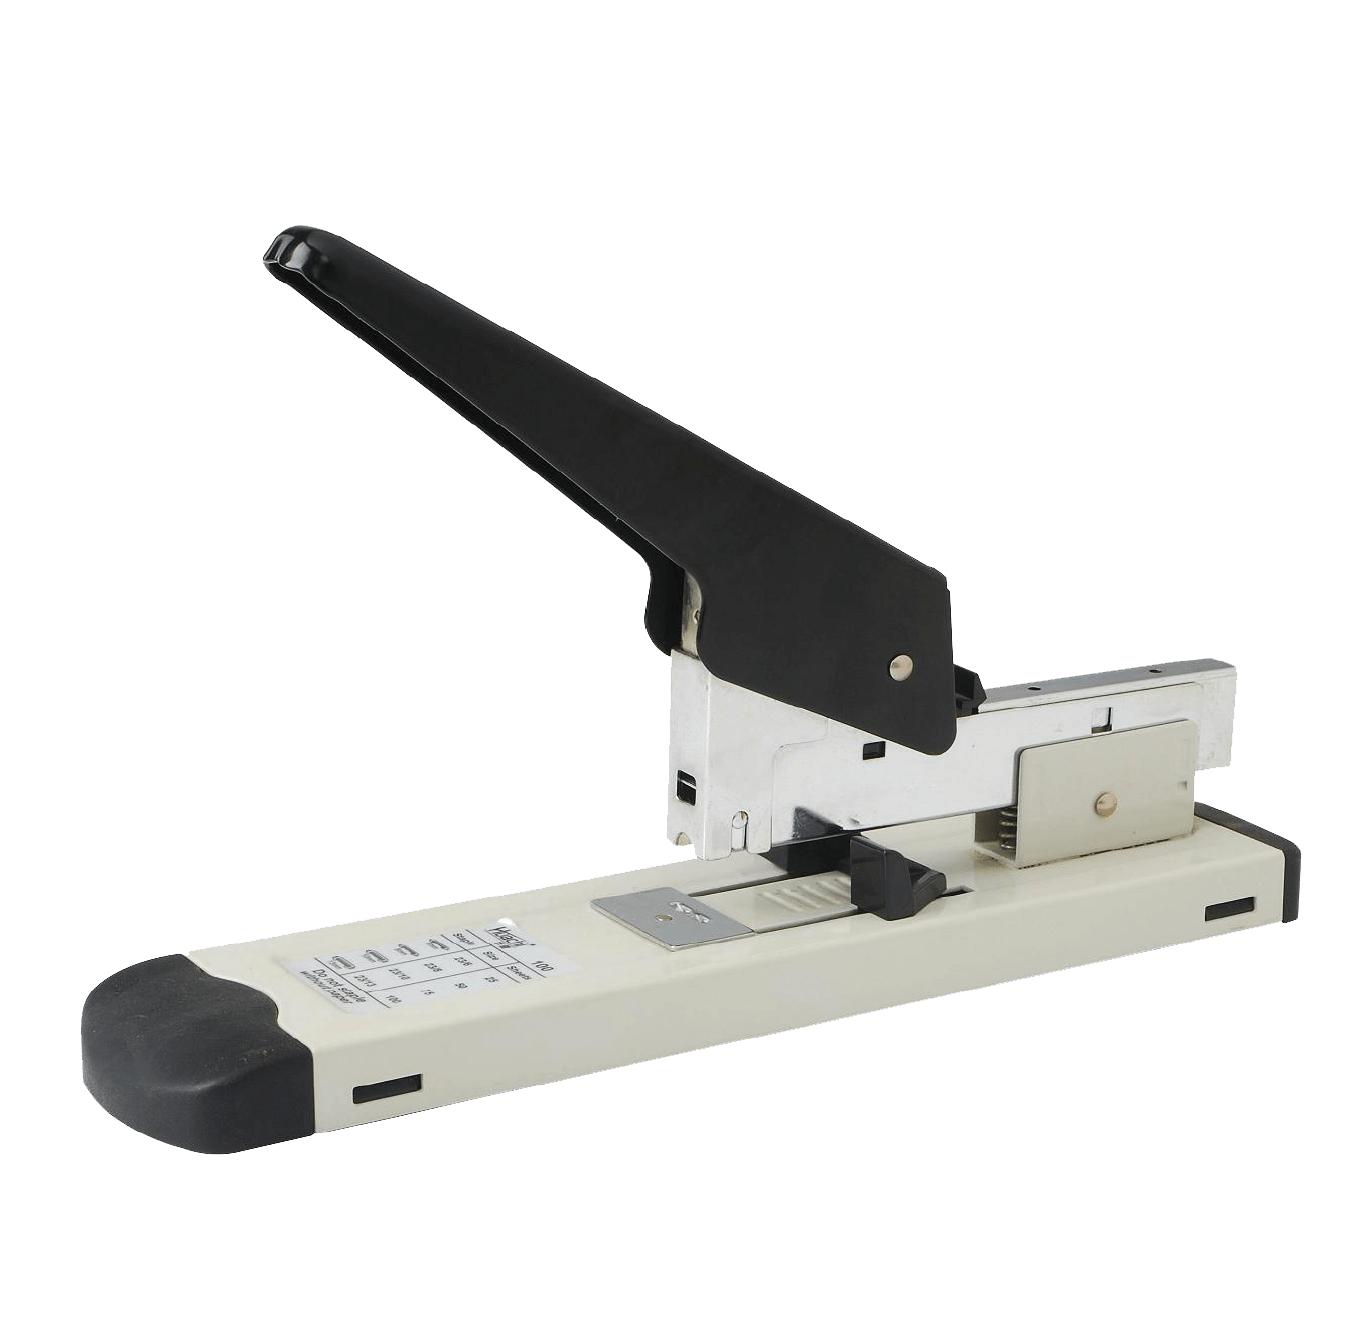 Grampeador Profissional Grande GE-1069 - Grampline